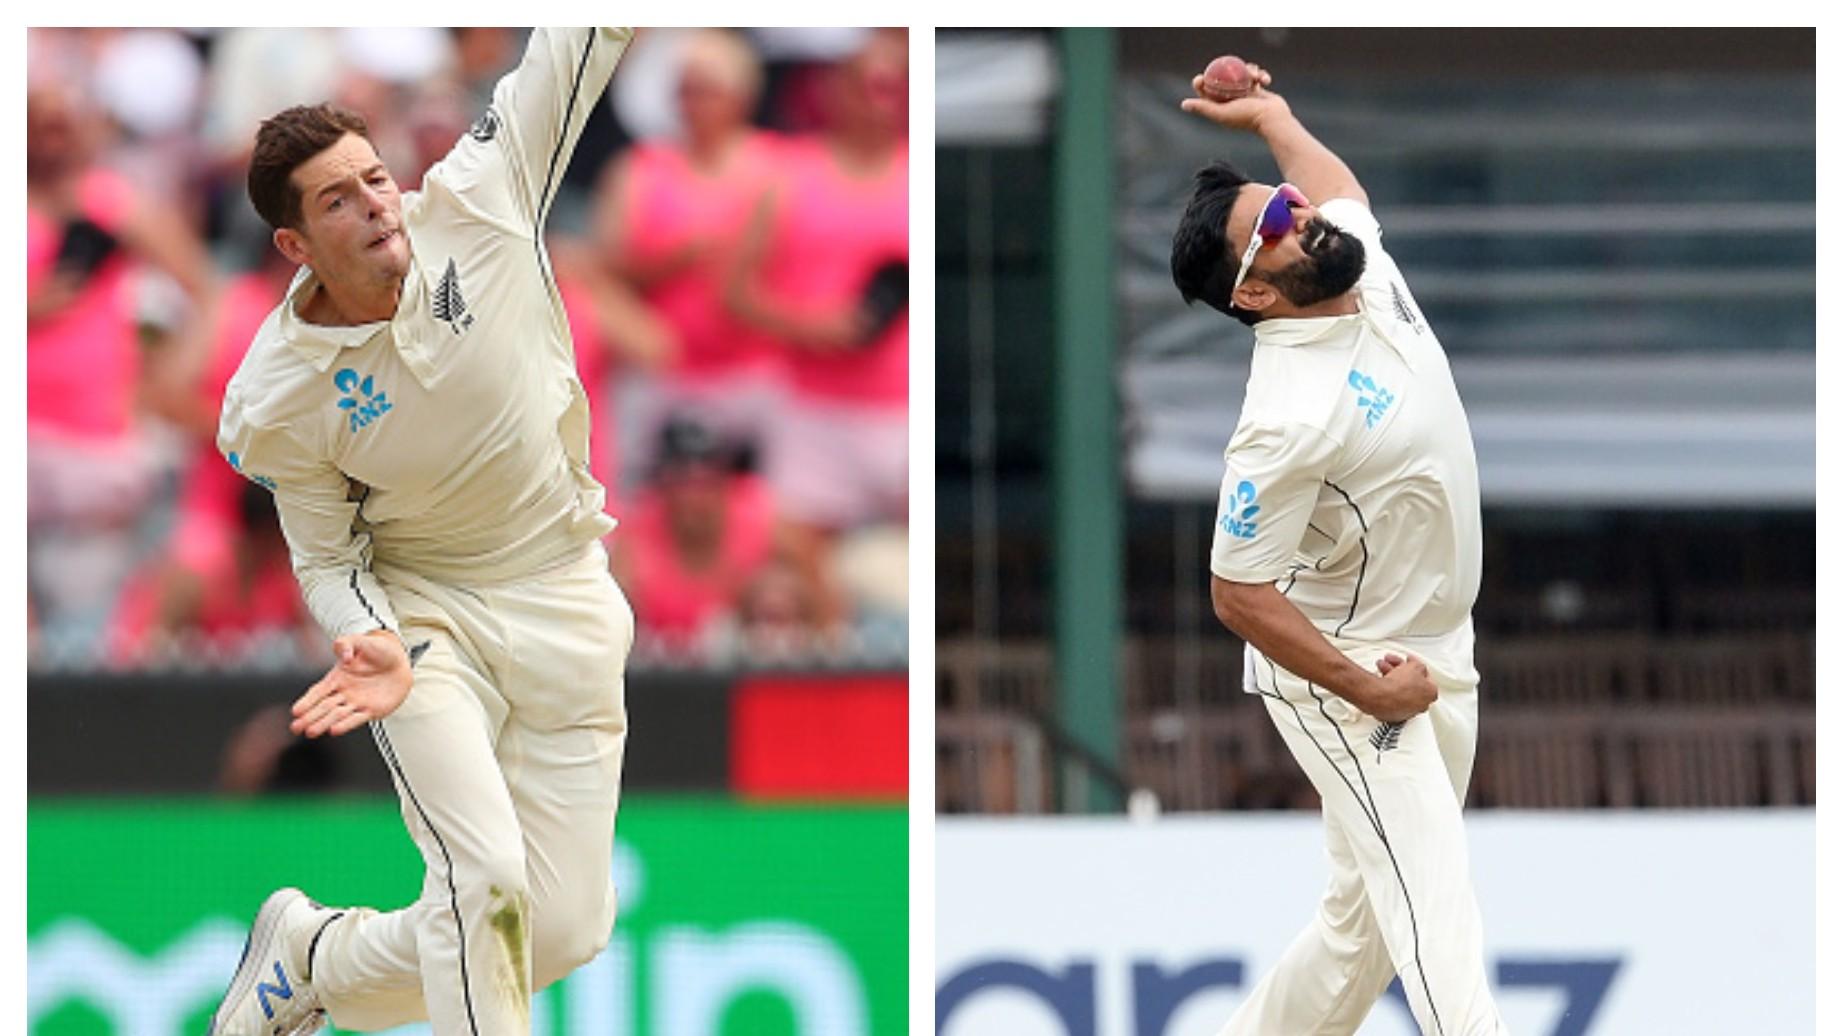 NZ v PAK 2020-21: New Zealand pick Mitchell Santner over Ajaz Patel for Pakistan Tests